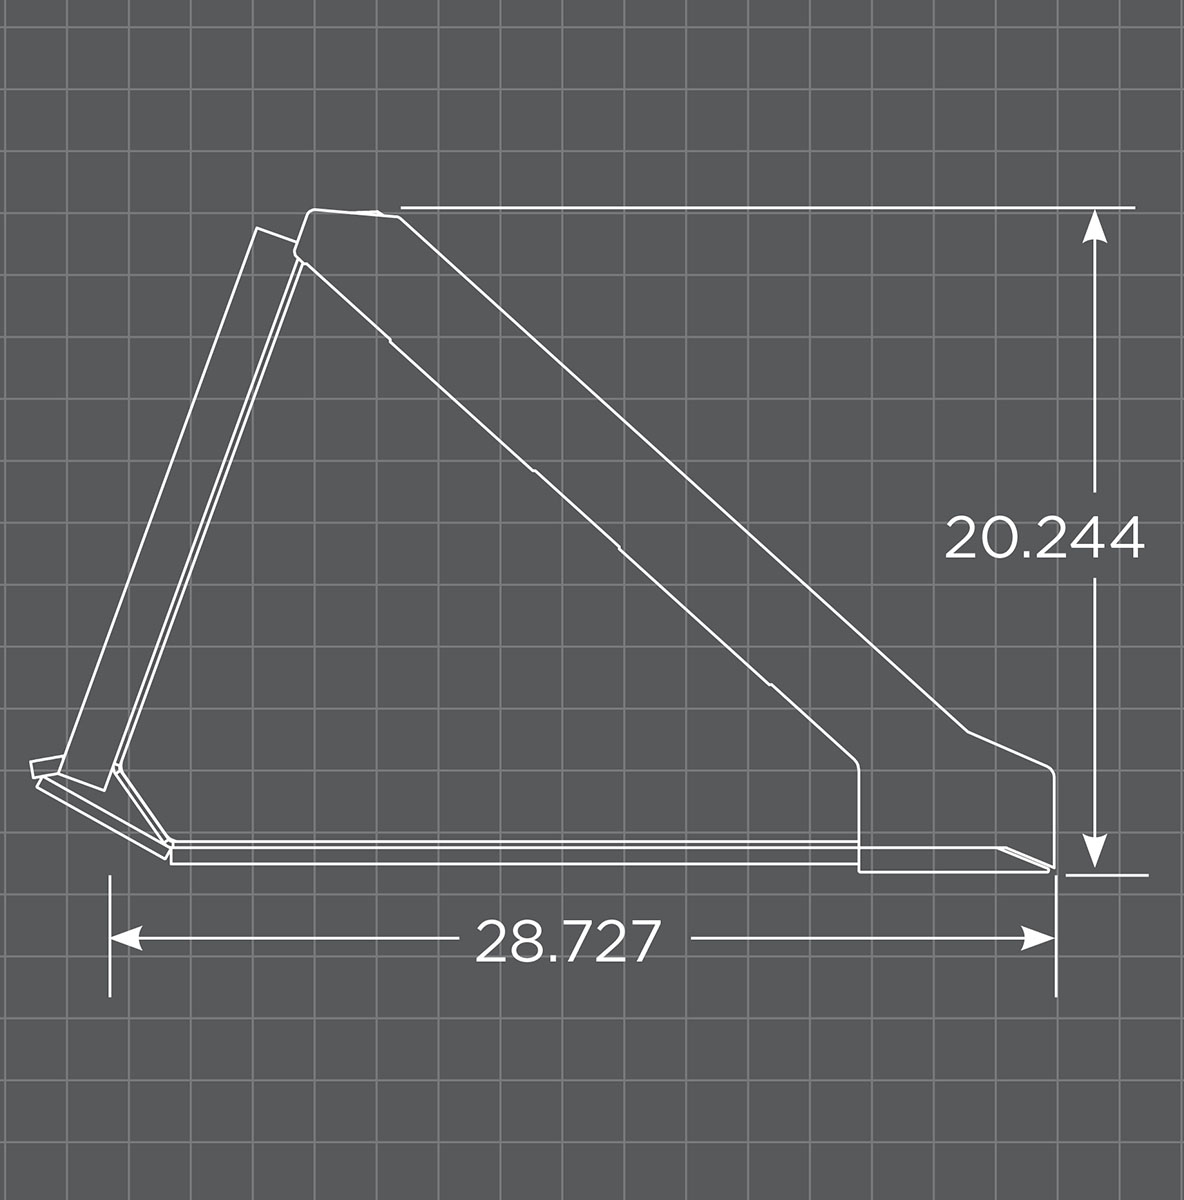 Standard Low Profile Bucket Schematic